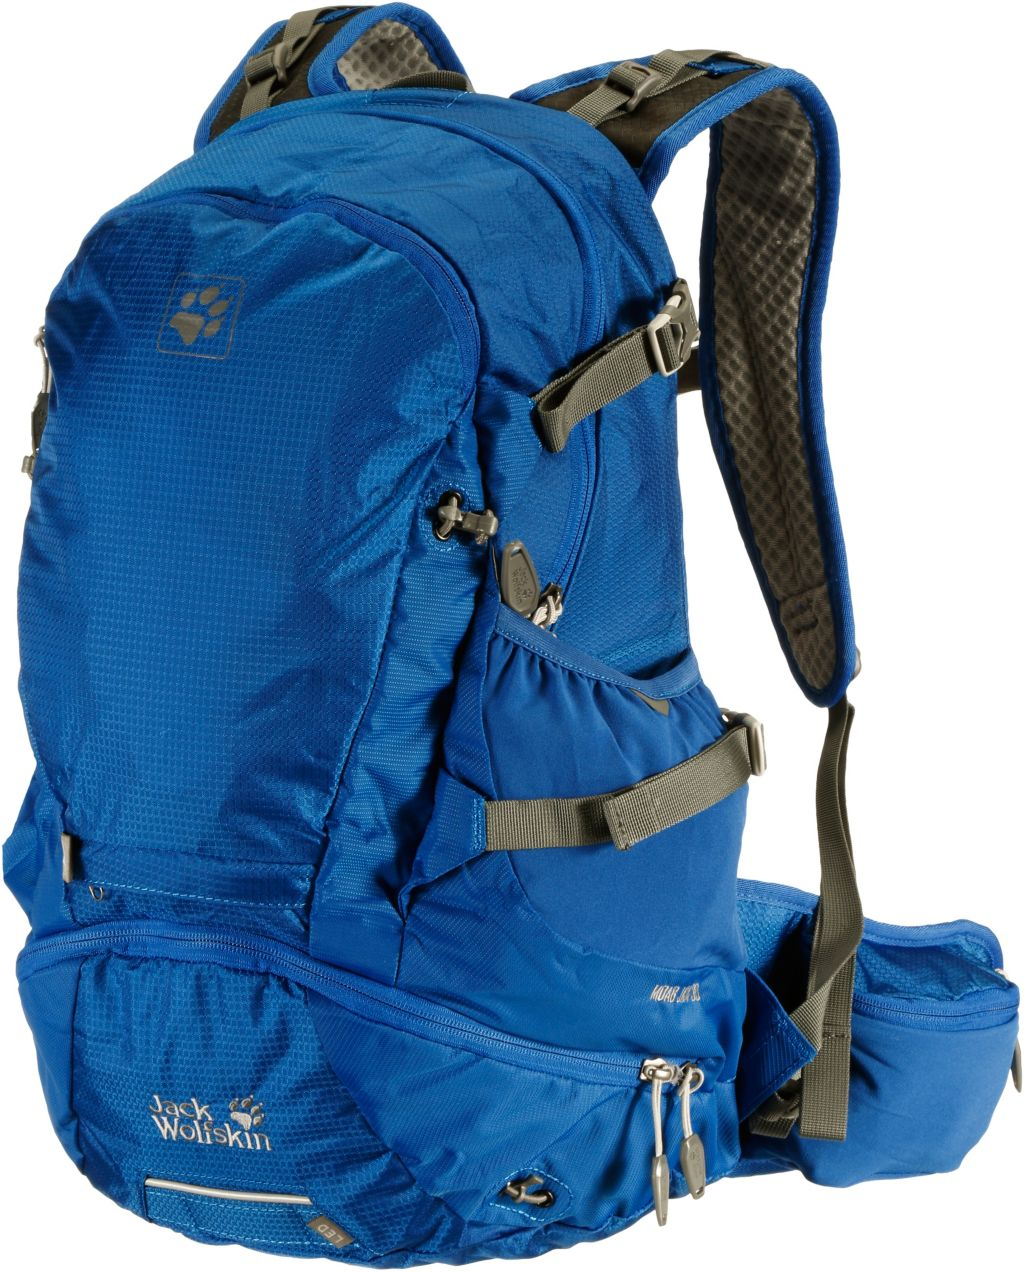 Moab Jam 30 Wanderrucksack in blau